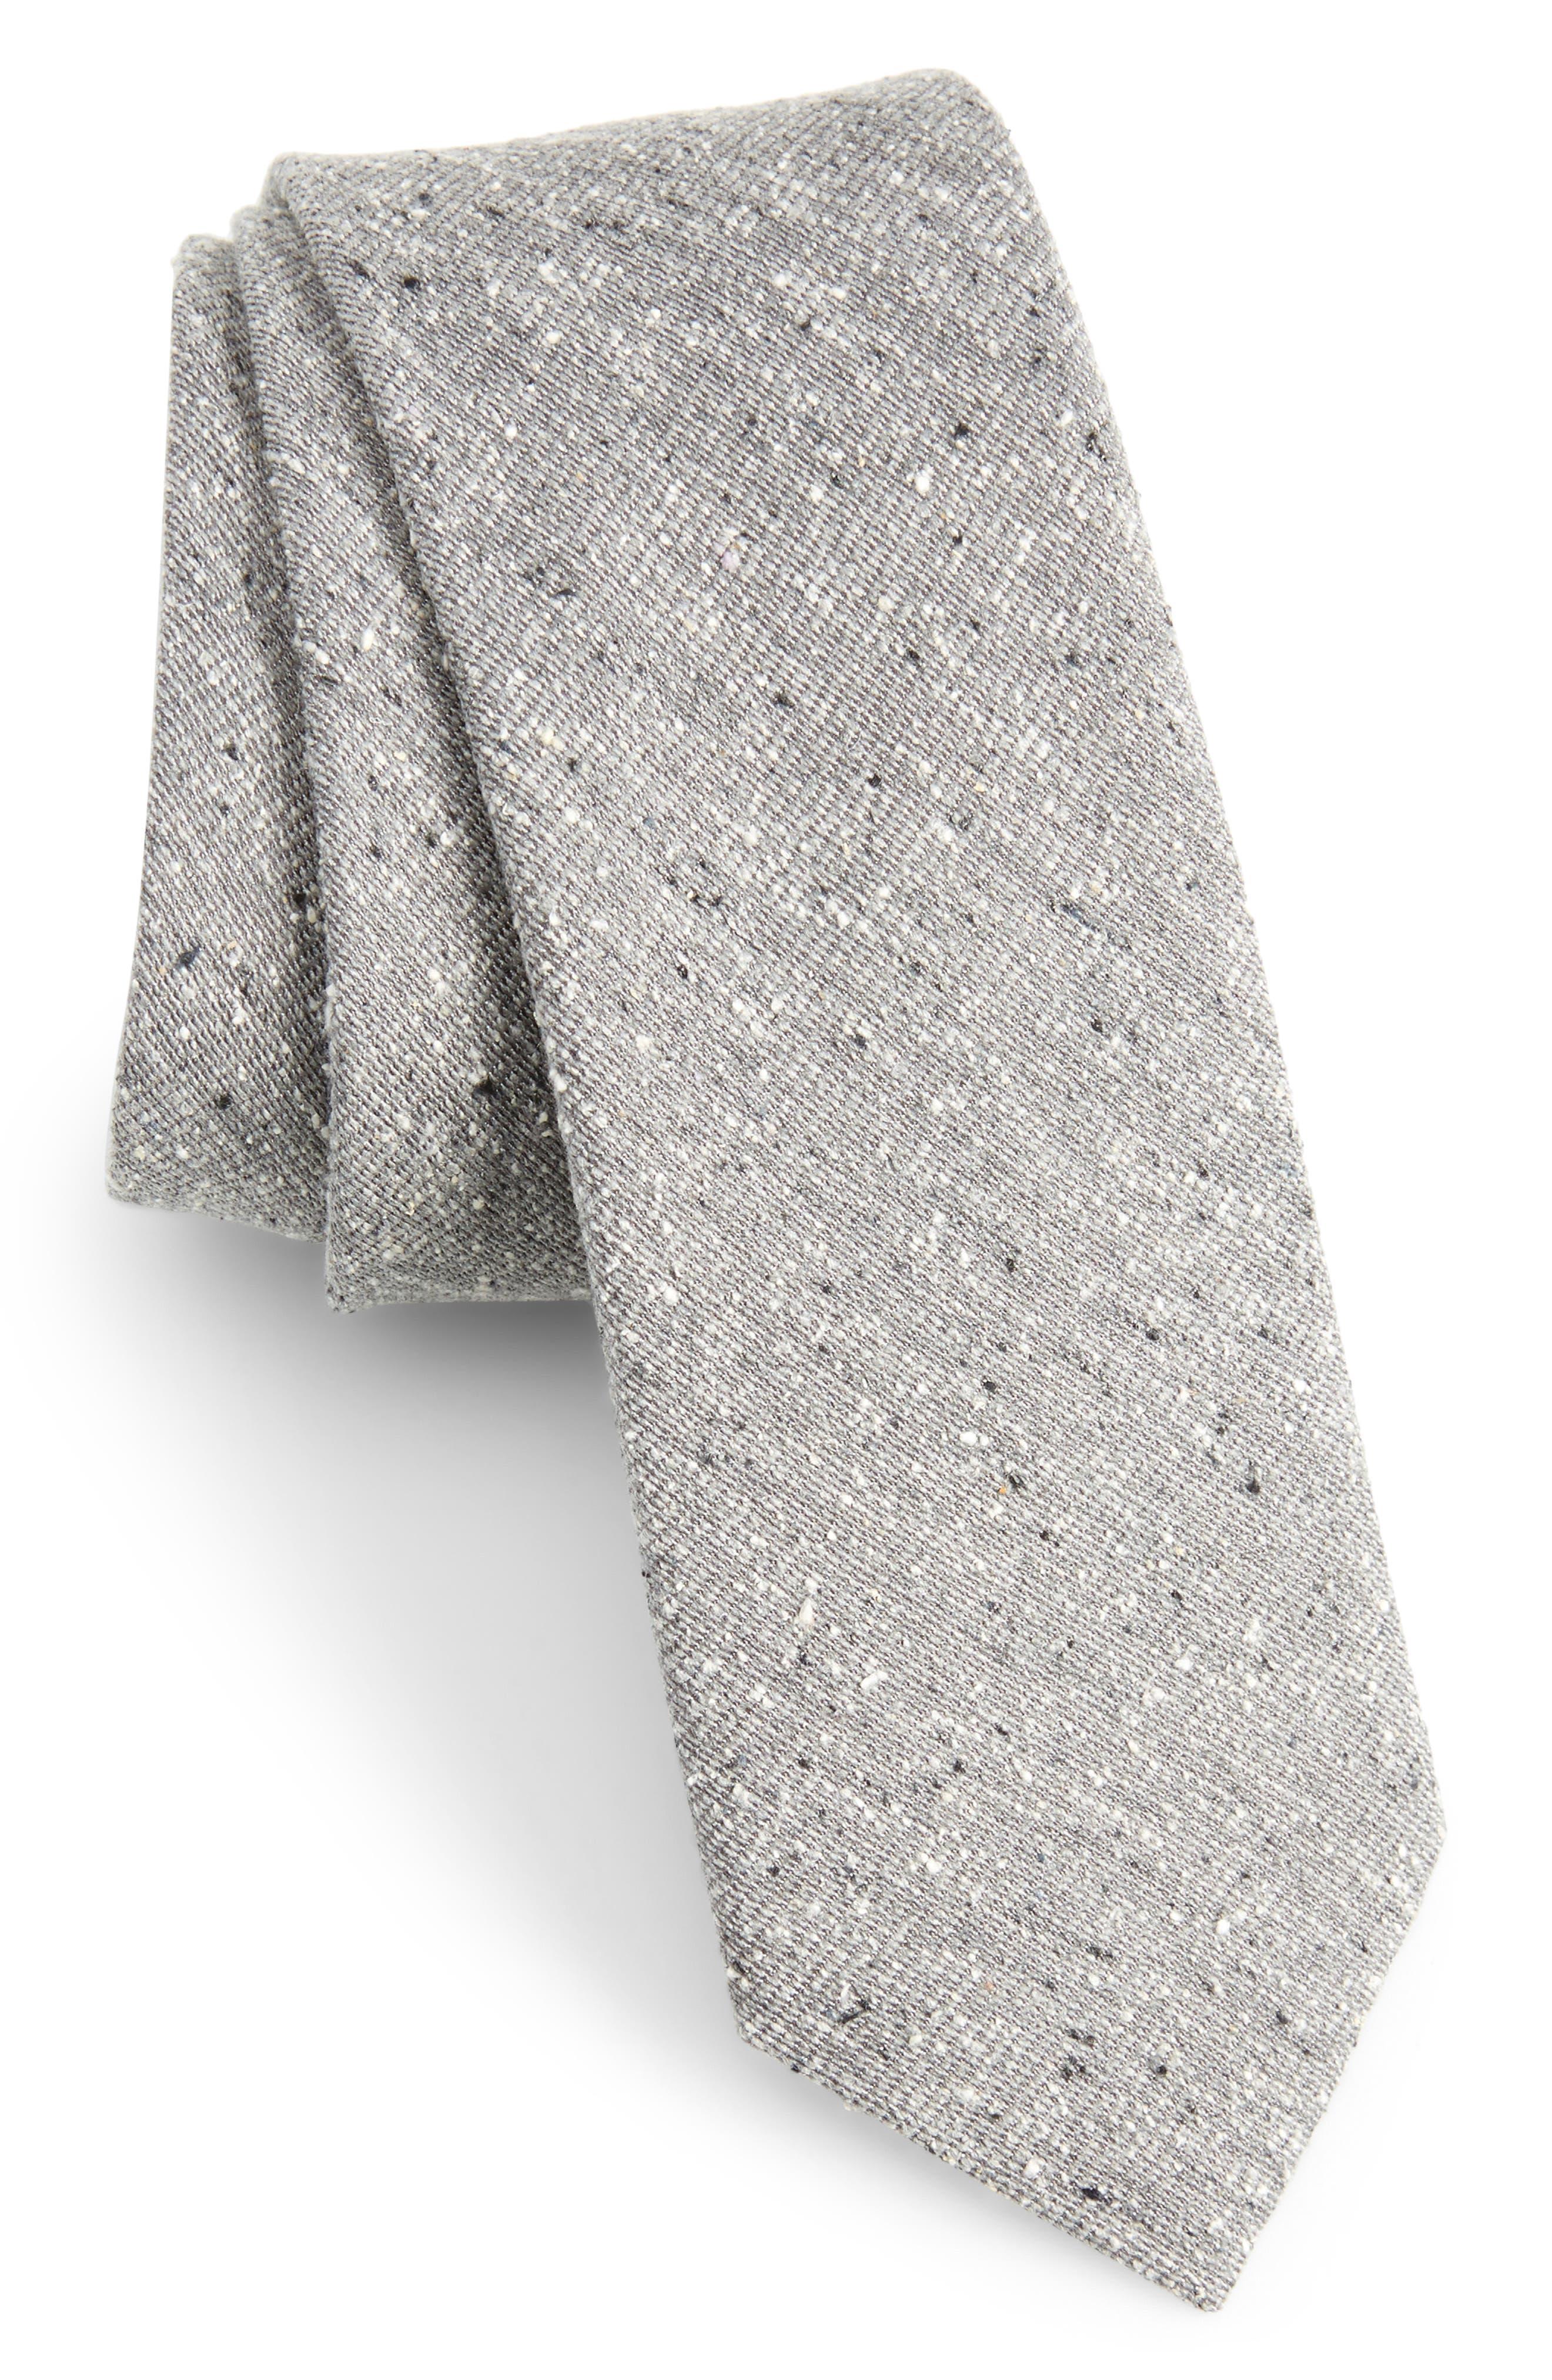 West Ridge Silk Skinny Tie,                             Main thumbnail 1, color,                             030